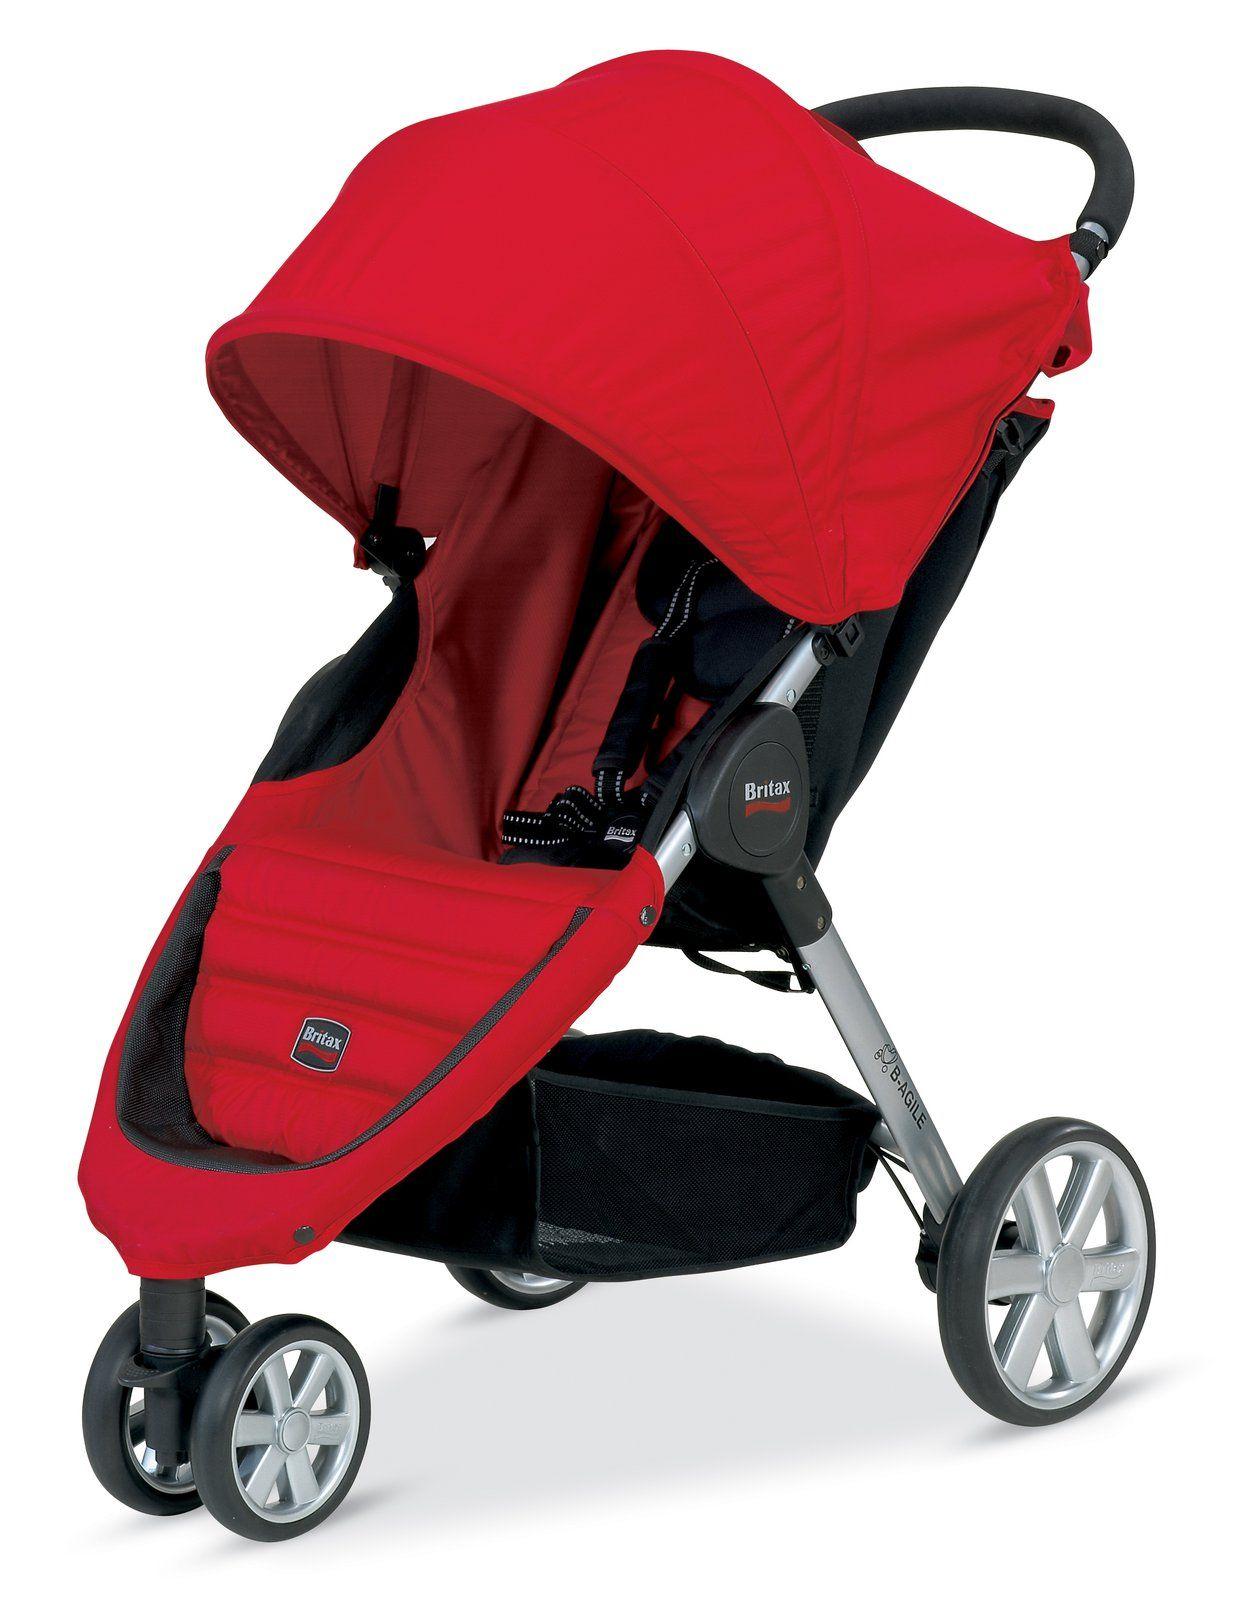 Britax BAgile Stroller Red Best Price Travel system